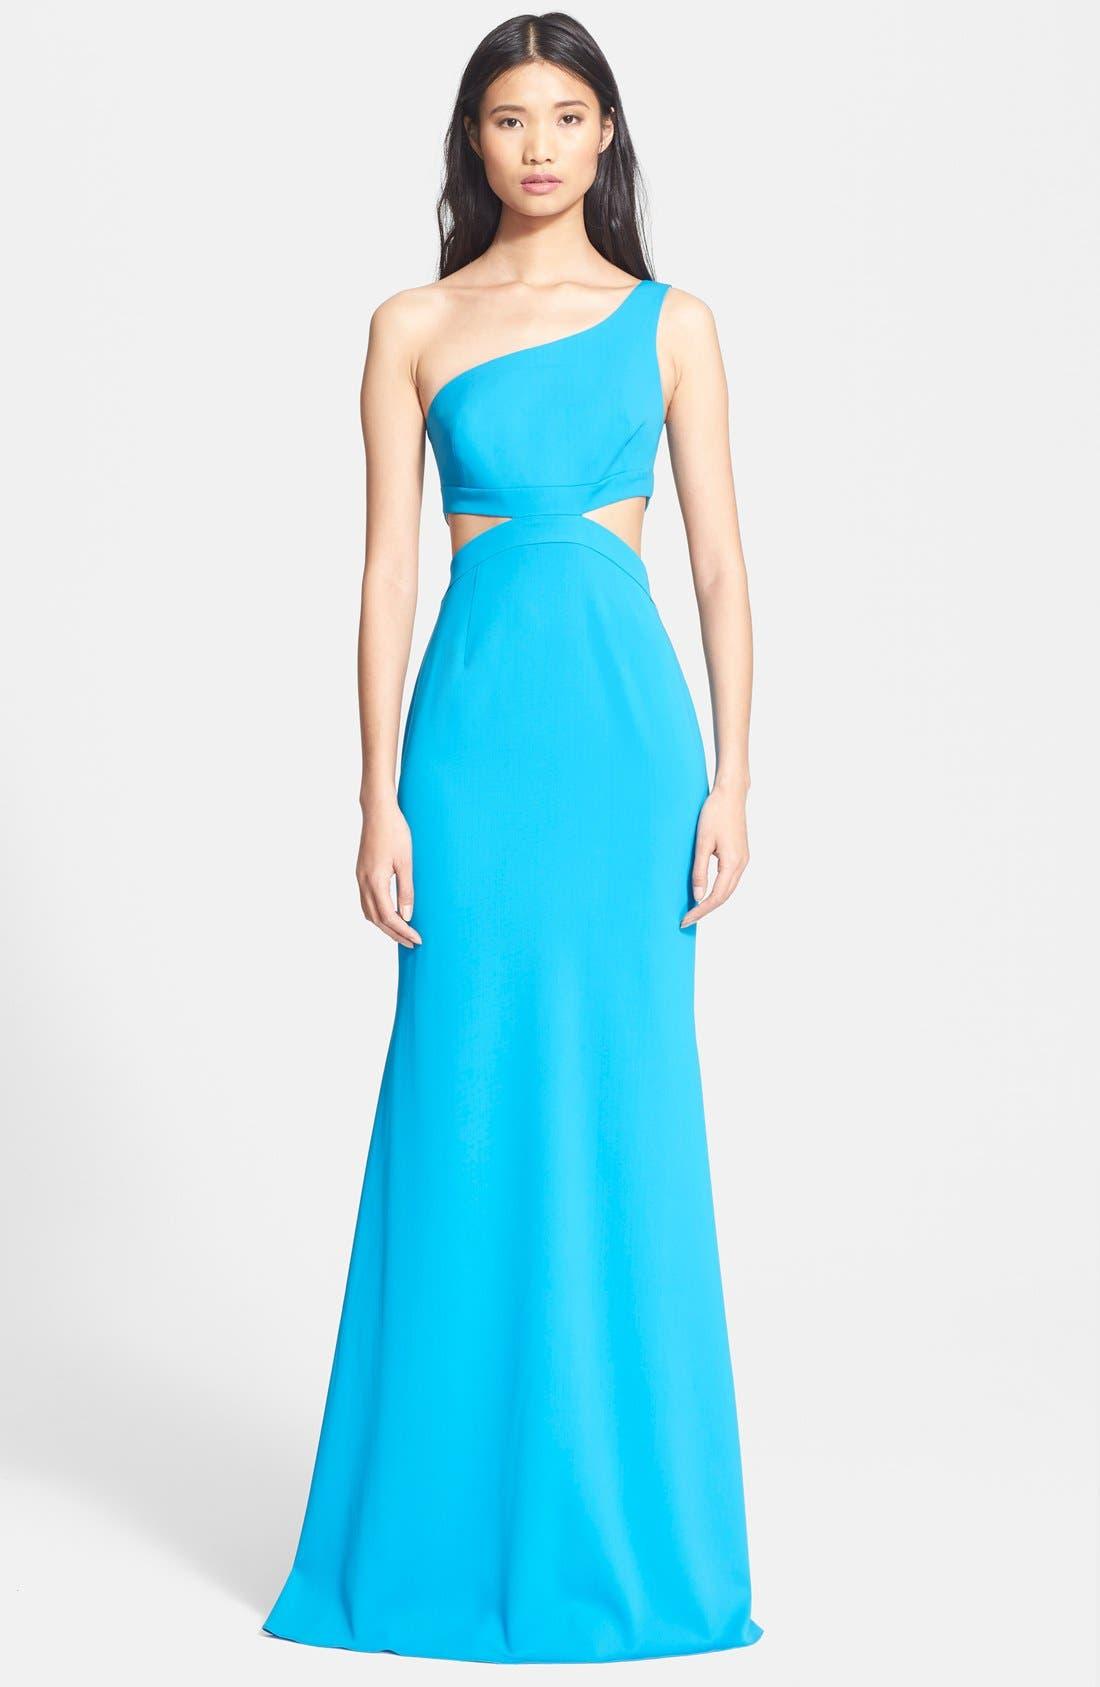 one shoulder cutout dress Blue Jay Godfrey D1ezVNi - inmoda-algerie.com